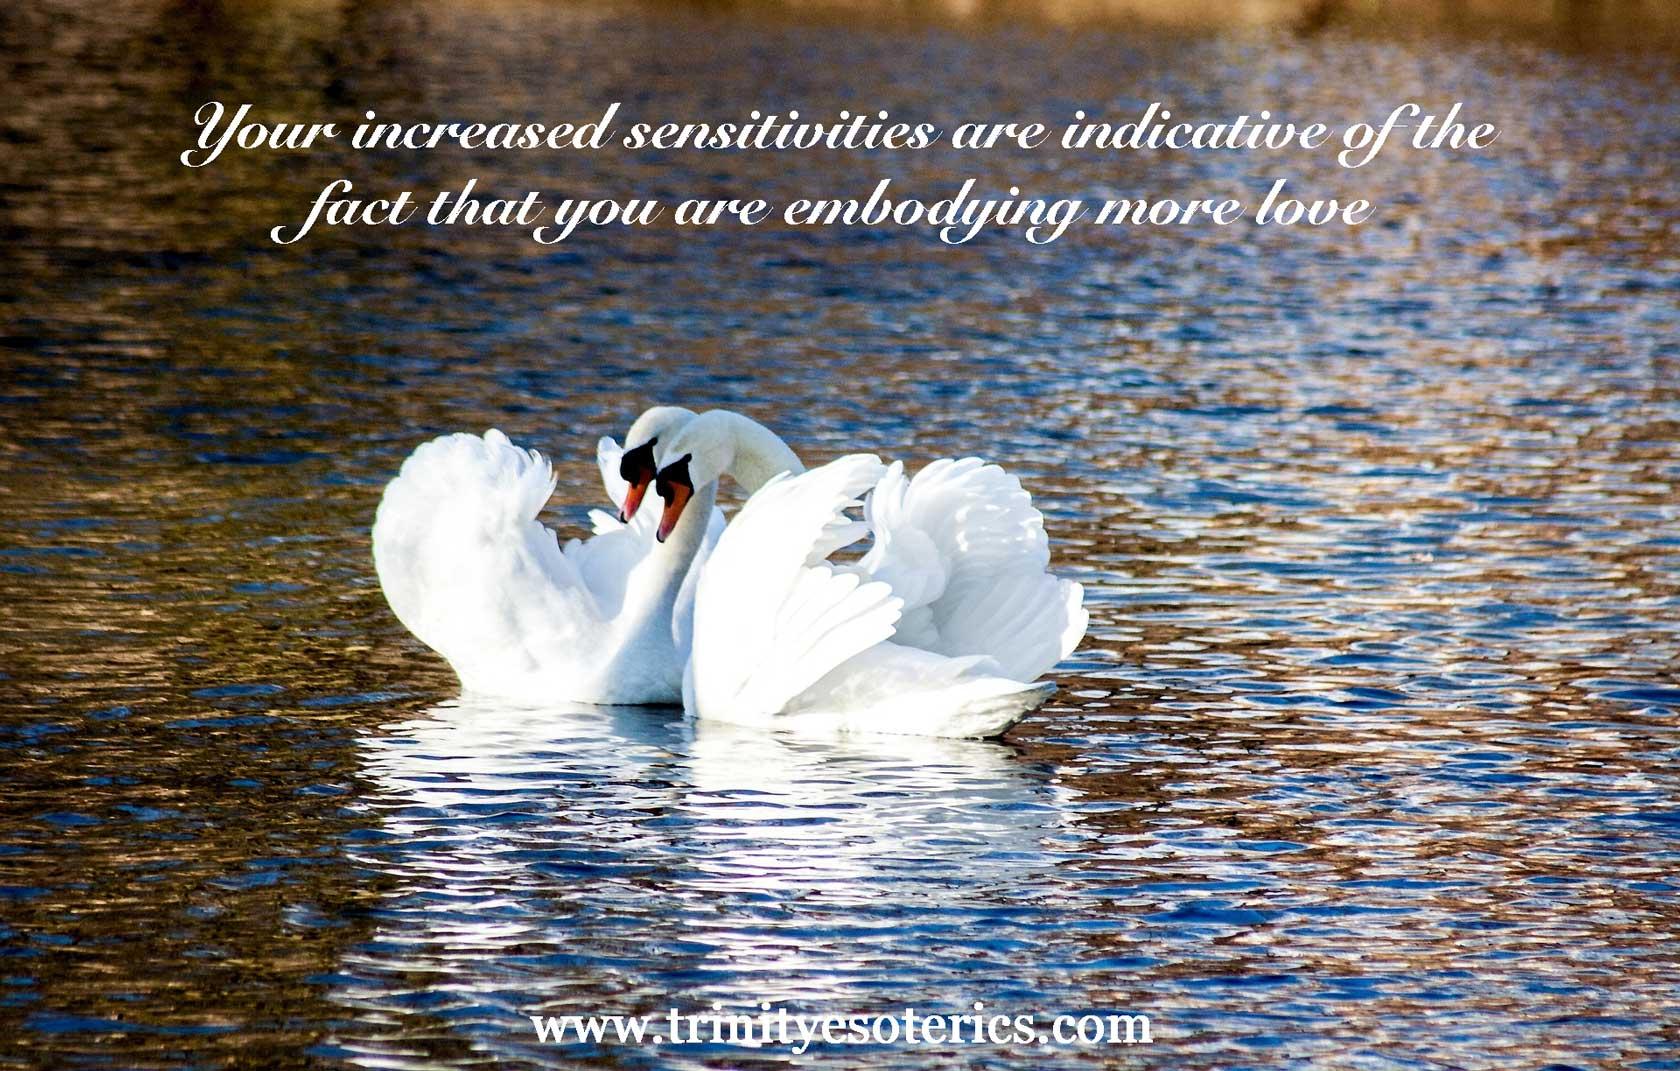 snuggling swans trinity esoterics